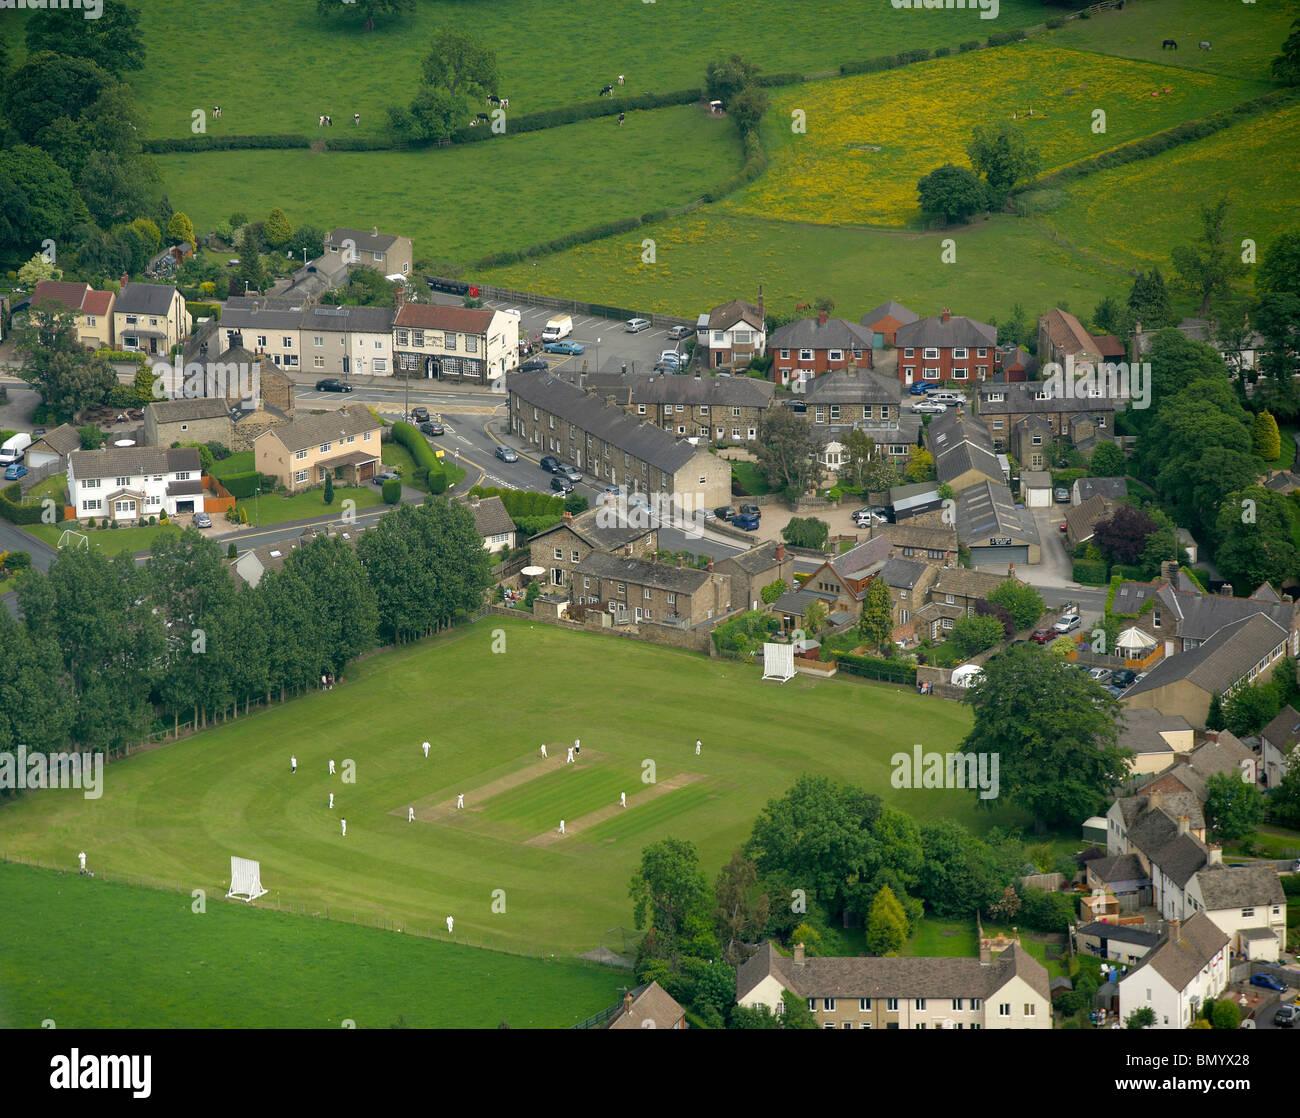 Village Cricket Match, Killinghall, Nr Harrogate North Yorkshire, Northern England - Stock Image